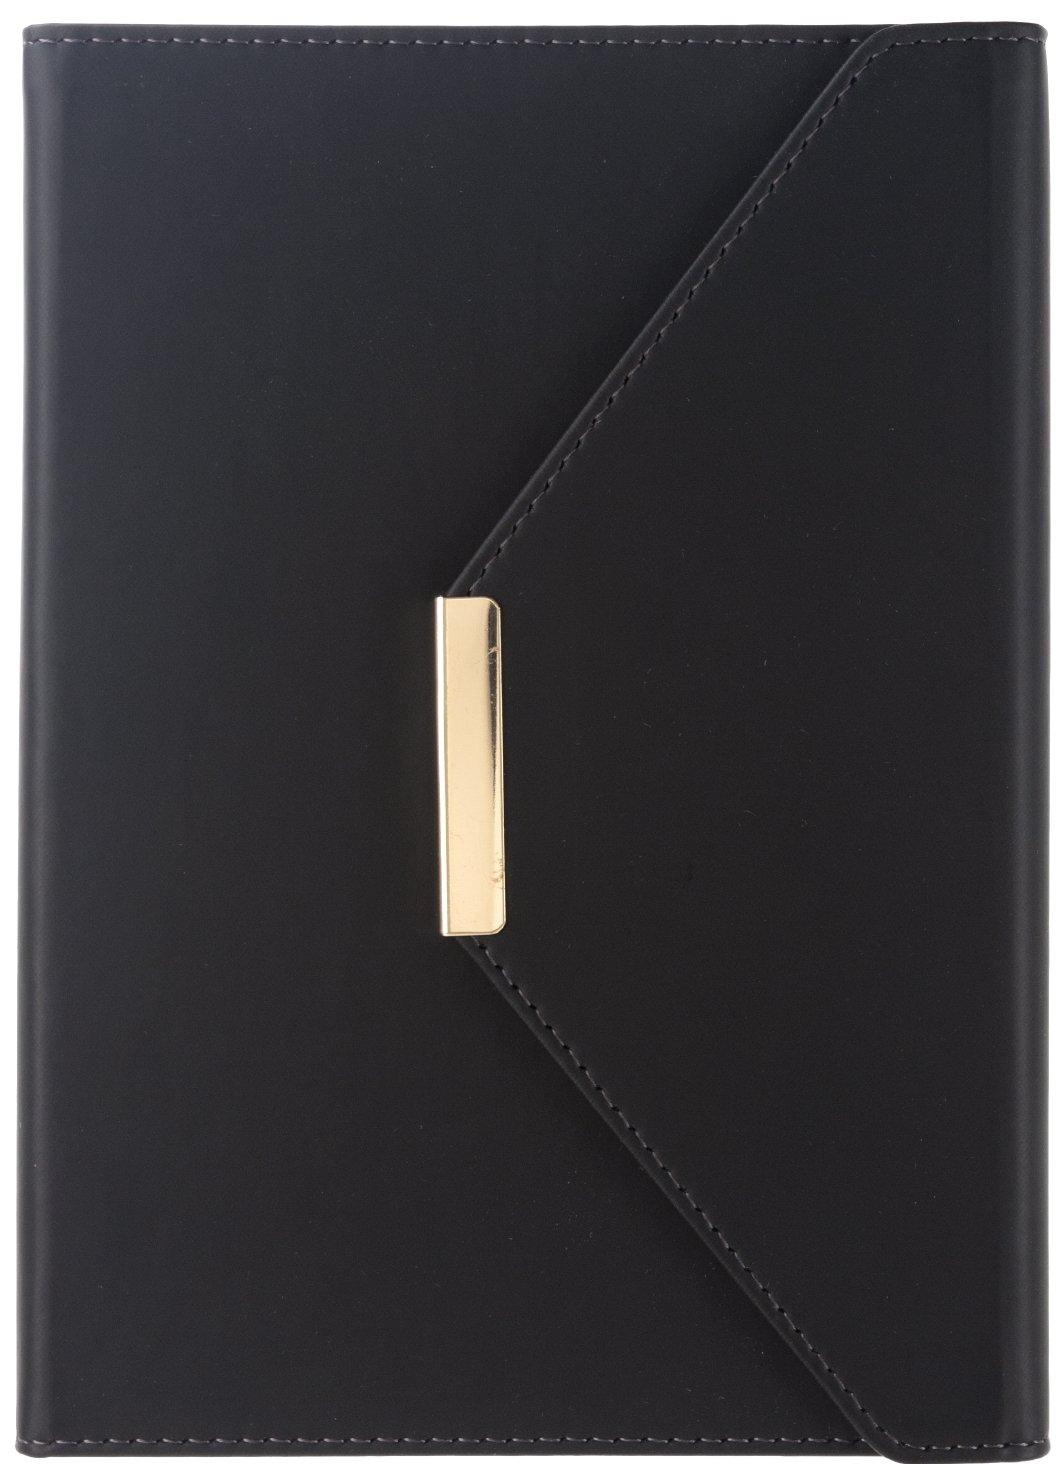 Eccolo Designer Black Gold Bar Hardcover Notebook, 6x8'', Magnetic Closure, Acid-free Lined Sheets